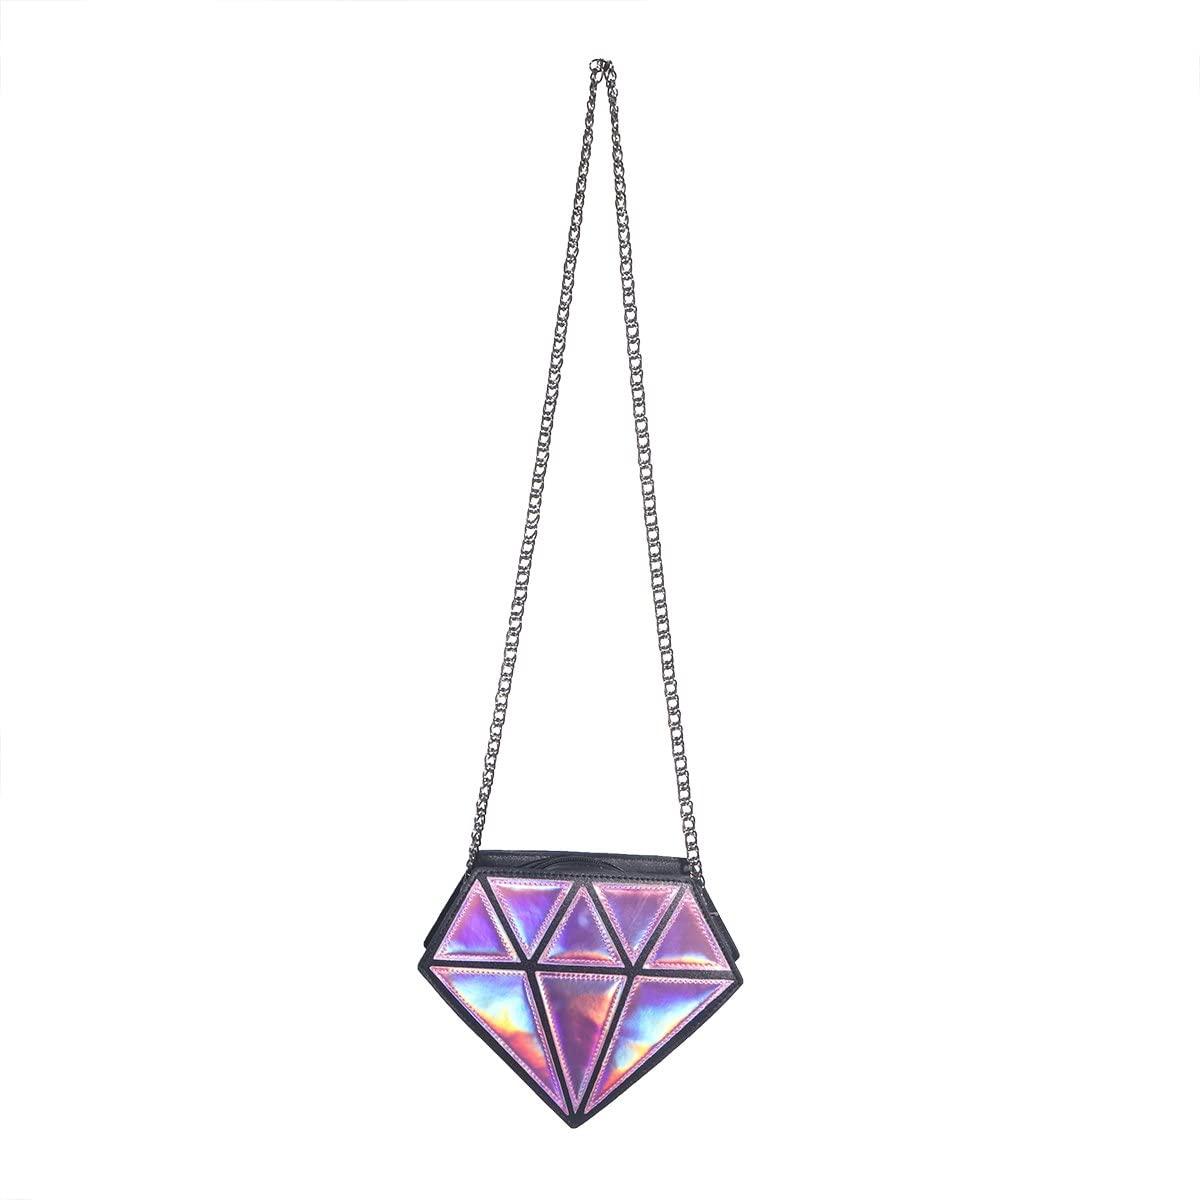 LUOEM Crossbody Bag Hologram Diamond Small Shoulder Bag PU Leather Chain Bag for Women